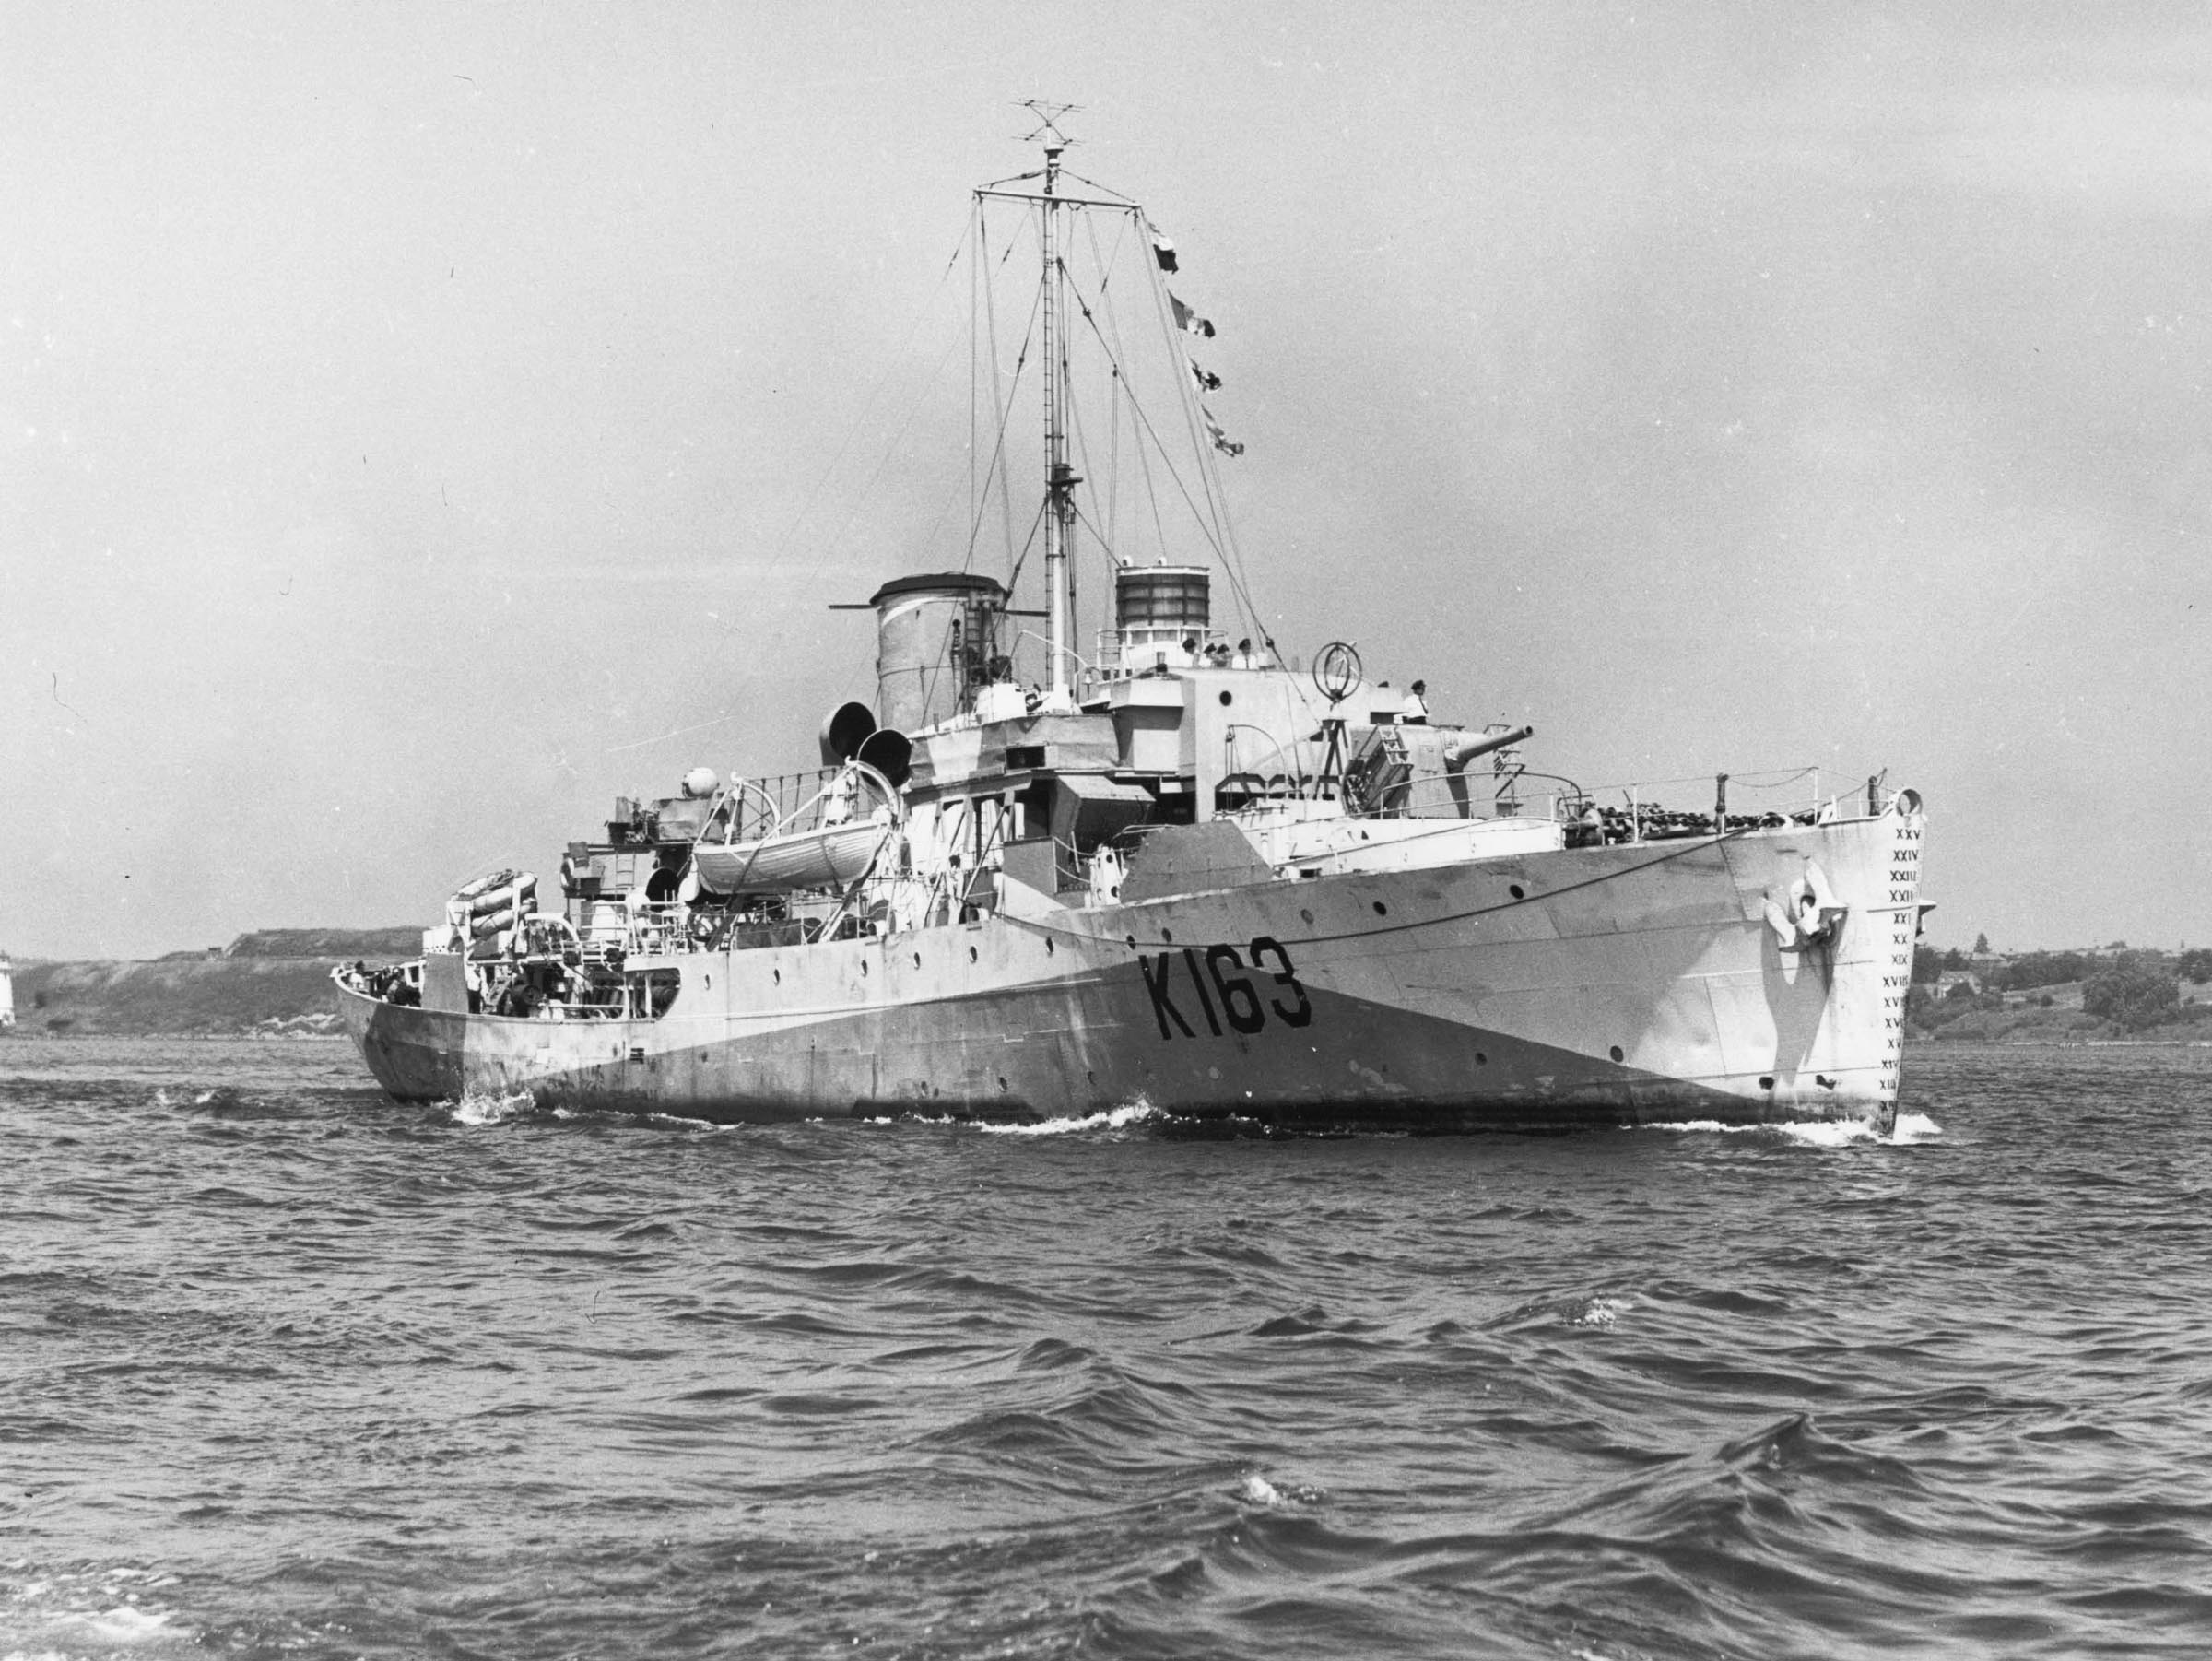 HMCS GALT